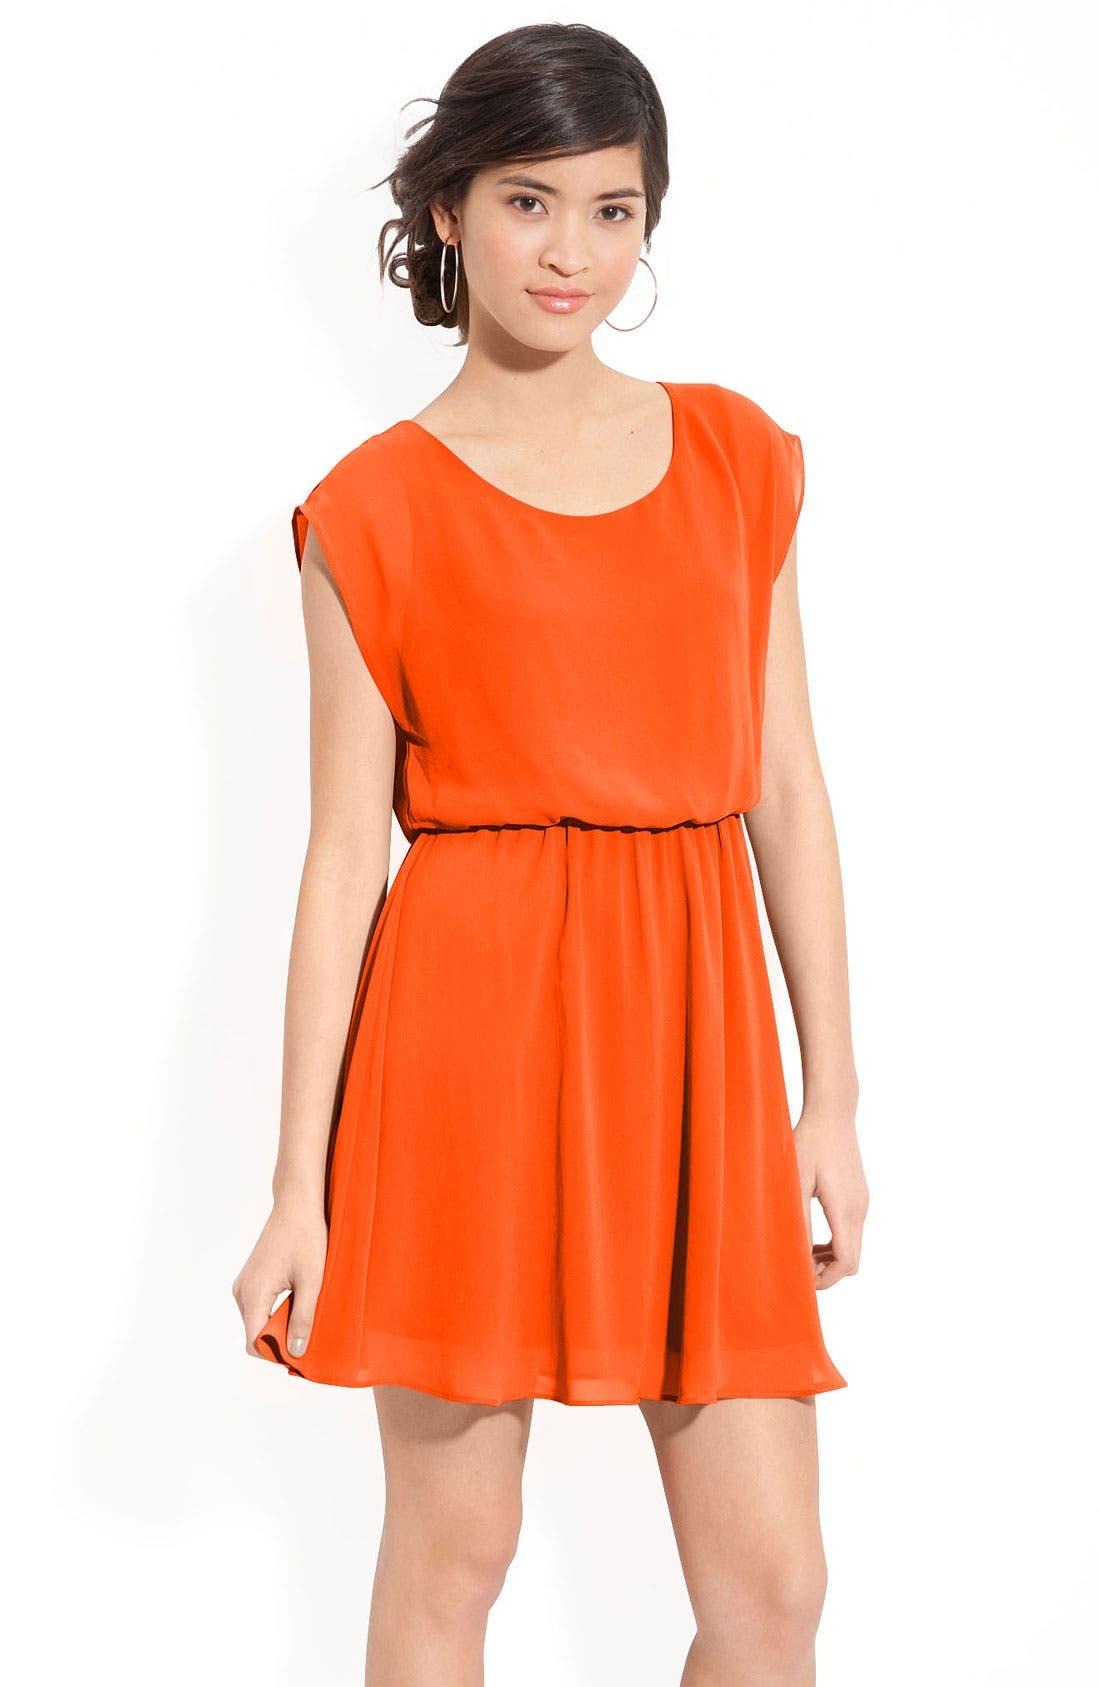 Alternate Image 1 Selected - Lush 'Harper' Chiffon Dress (Juniors)